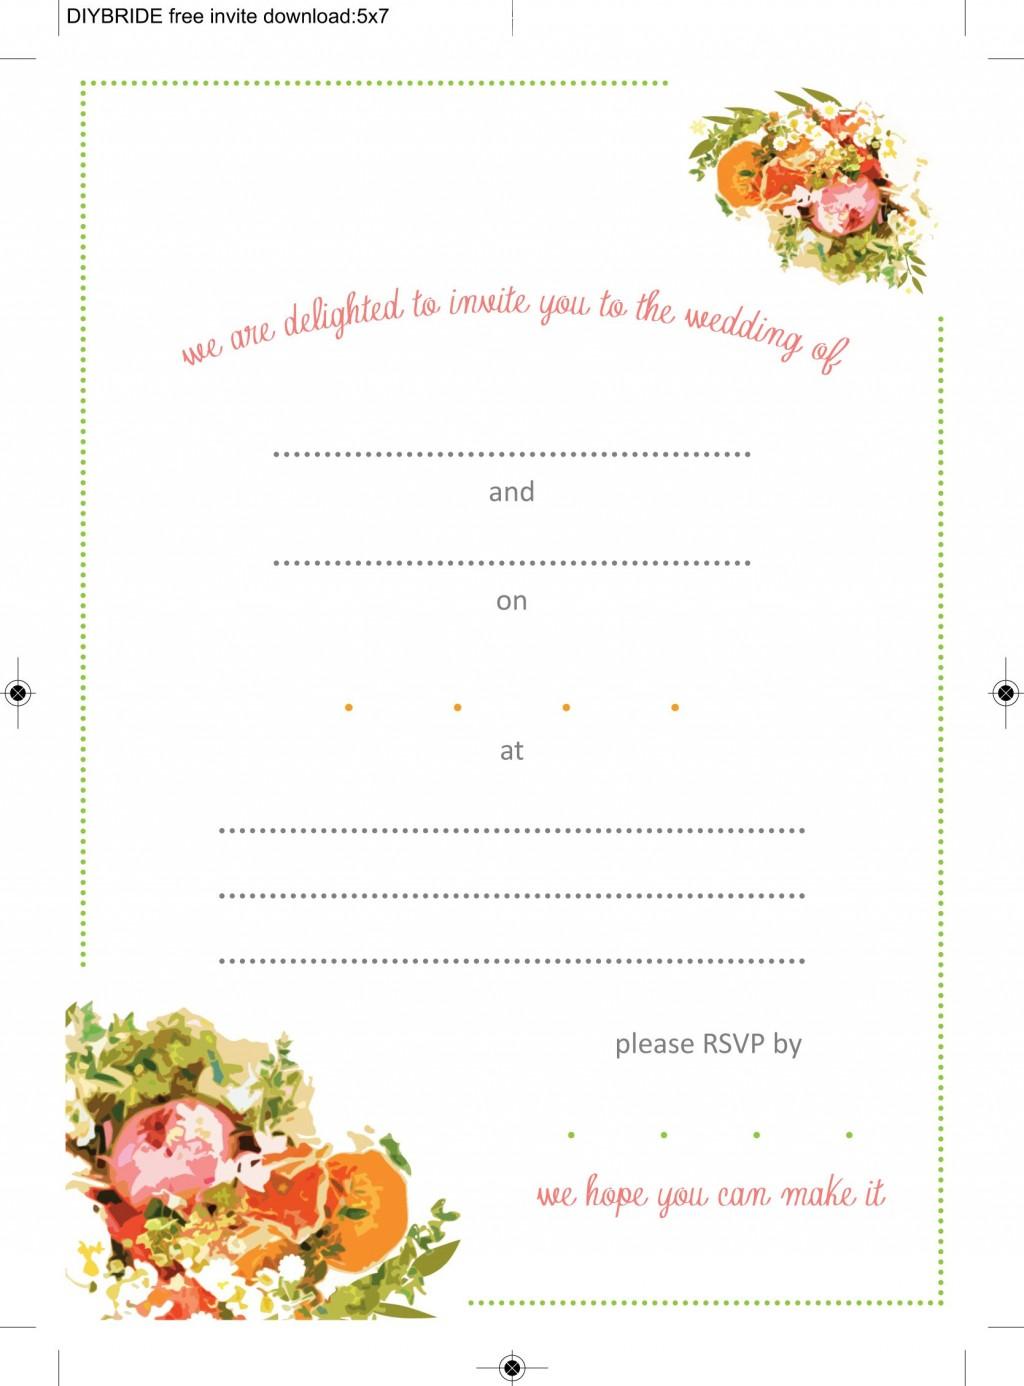 001 Stupendou Wedding Invitation Template Word High Definition  Invite Wording Uk Anniversary Microsoft Free MarriageLarge